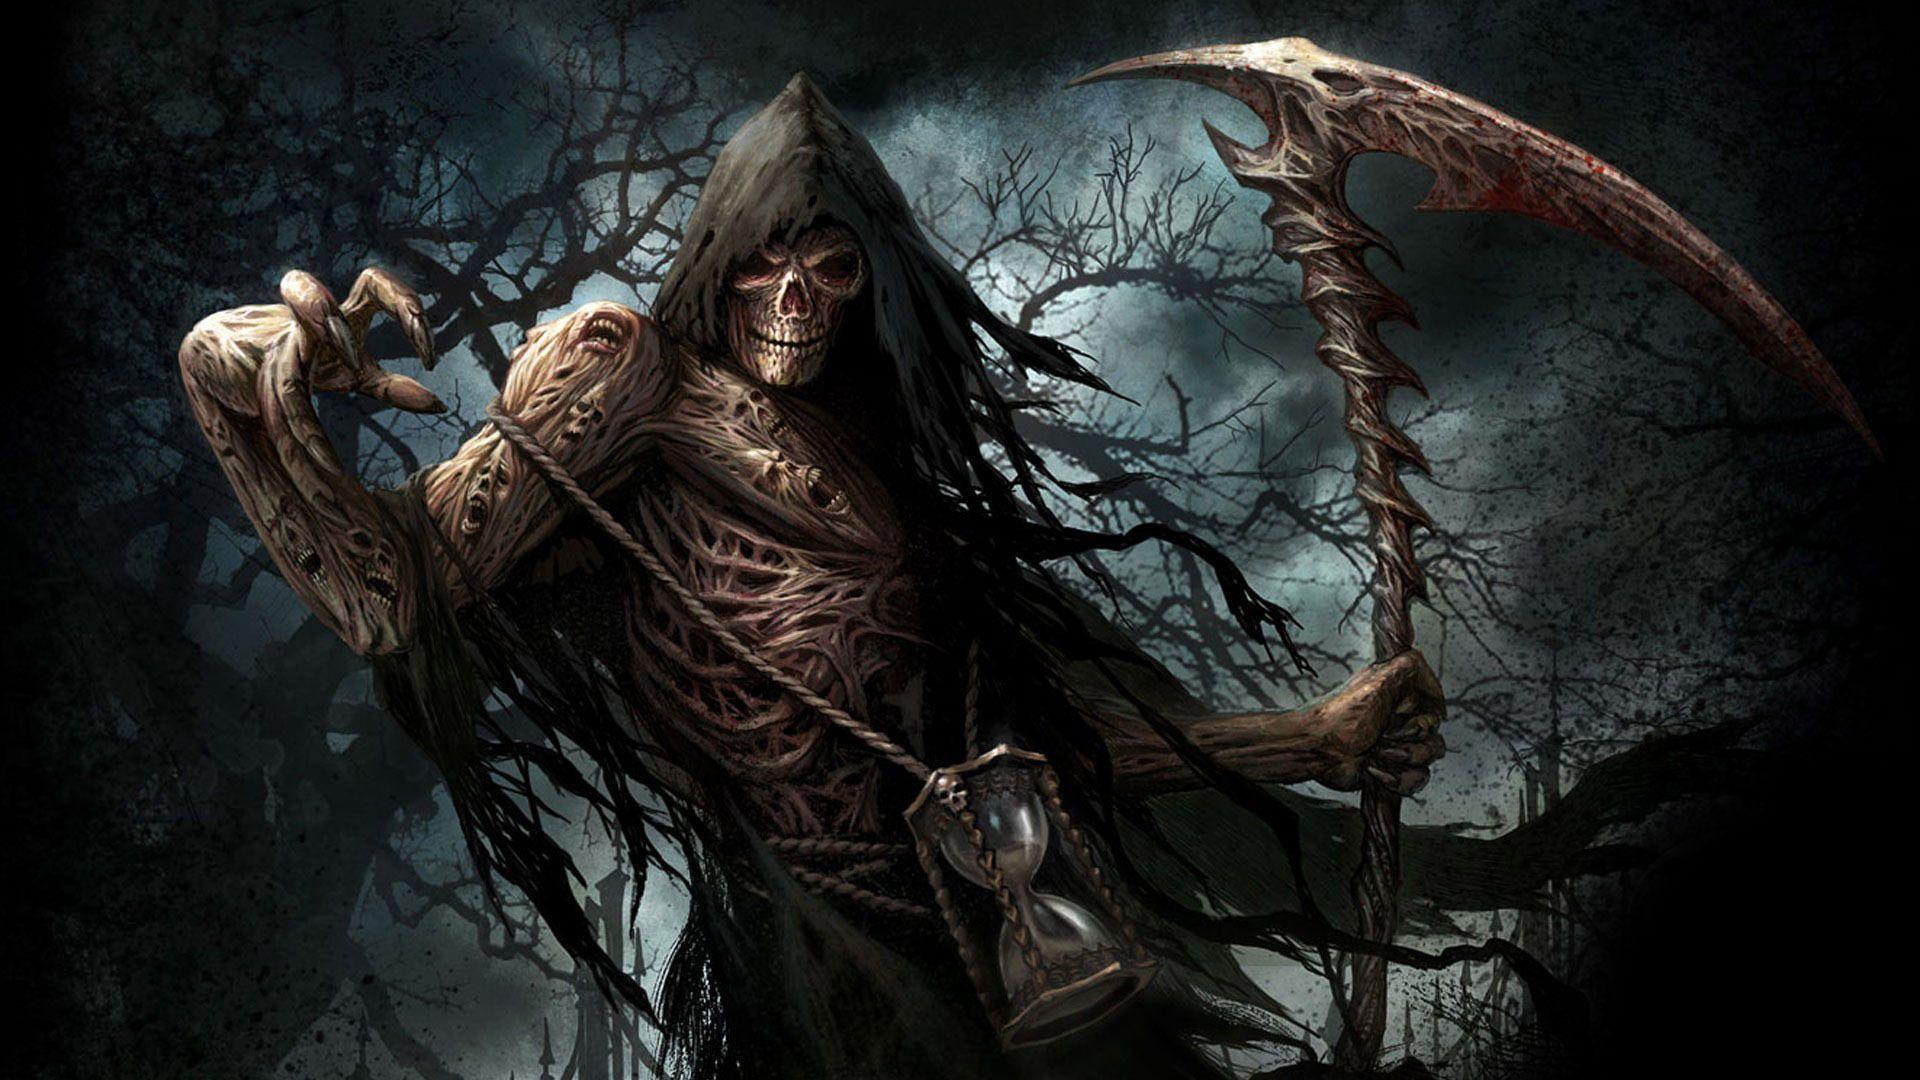 Realistic Grim Reaper Wallpapers Top Free Realistic Grim Reaper Backgrounds Wallpaperaccess